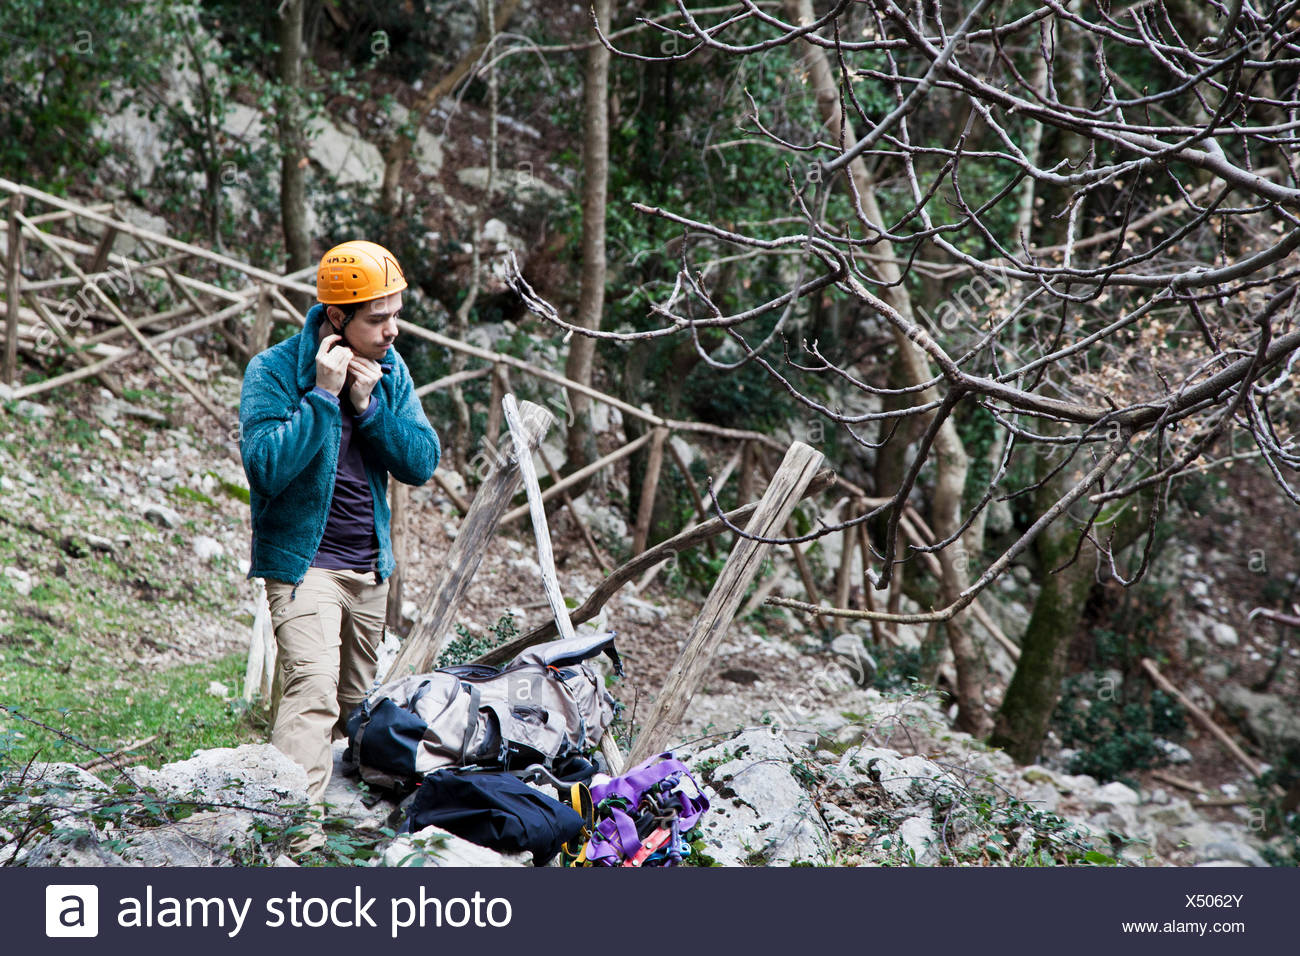 Italy, Lazio, Roccia, Man adjusting helmet before climbing - Stock Image